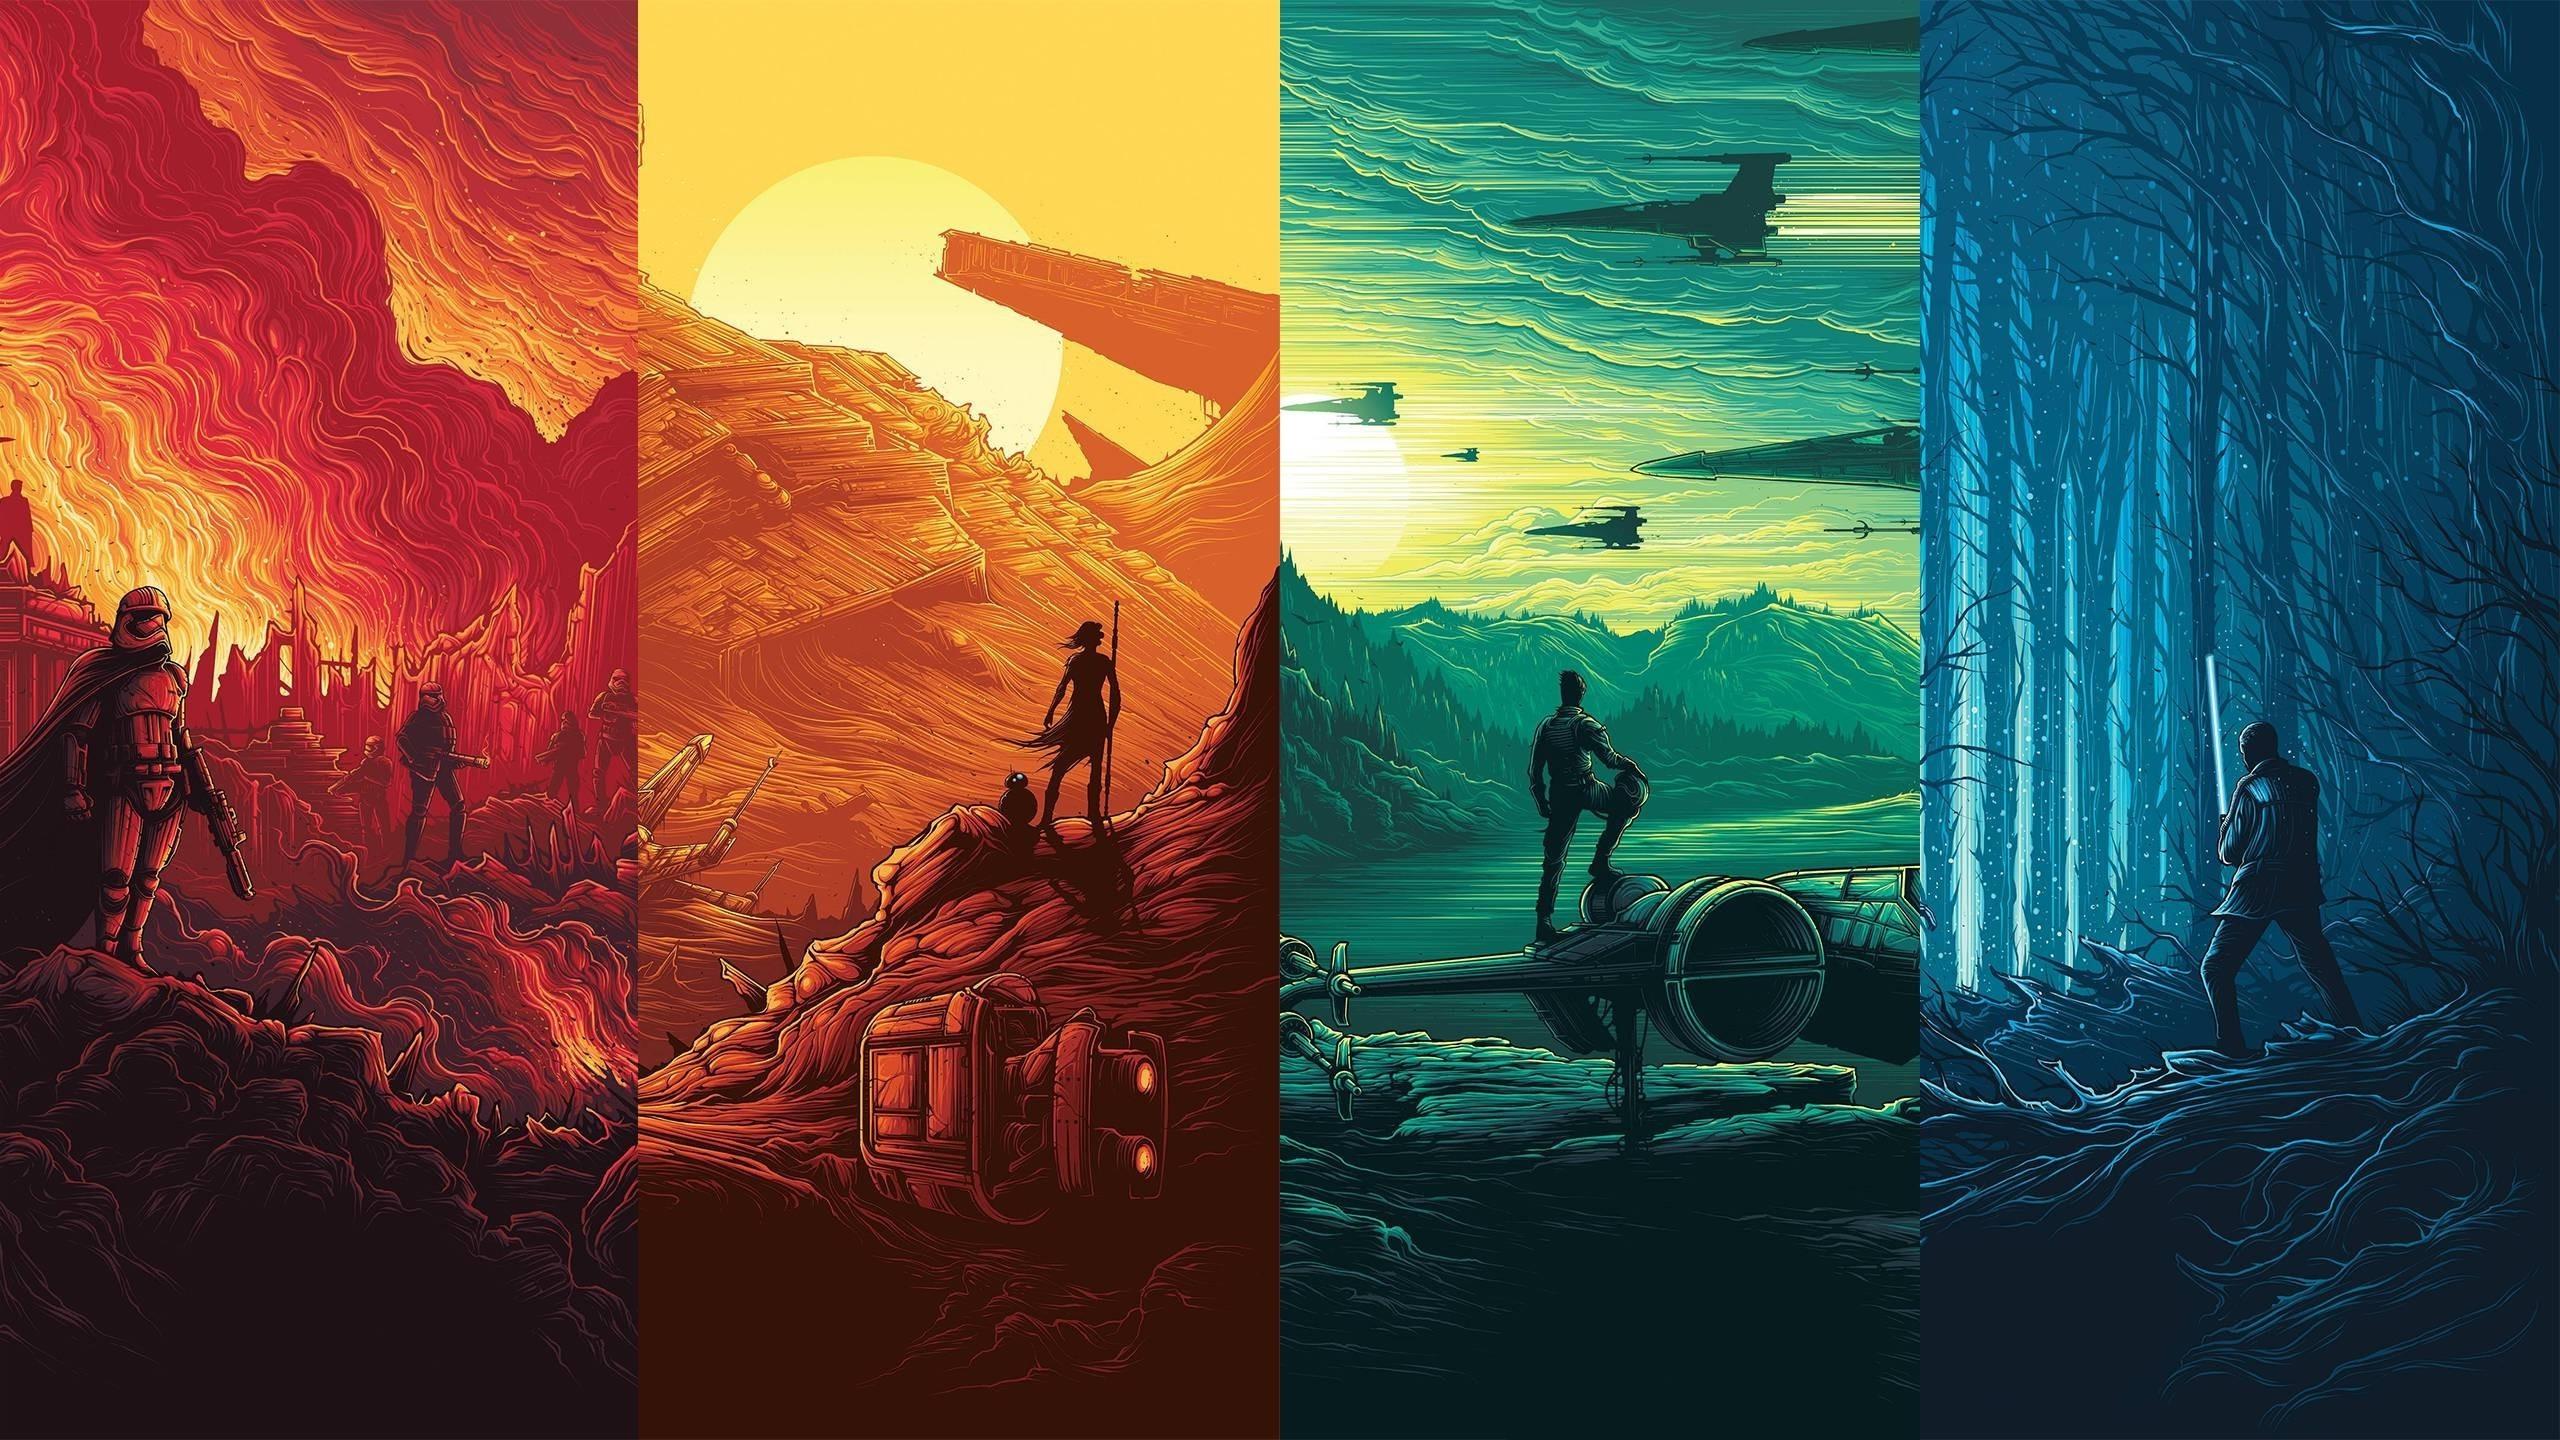 star wars episode 7 wallpaper ·① download free stunning high